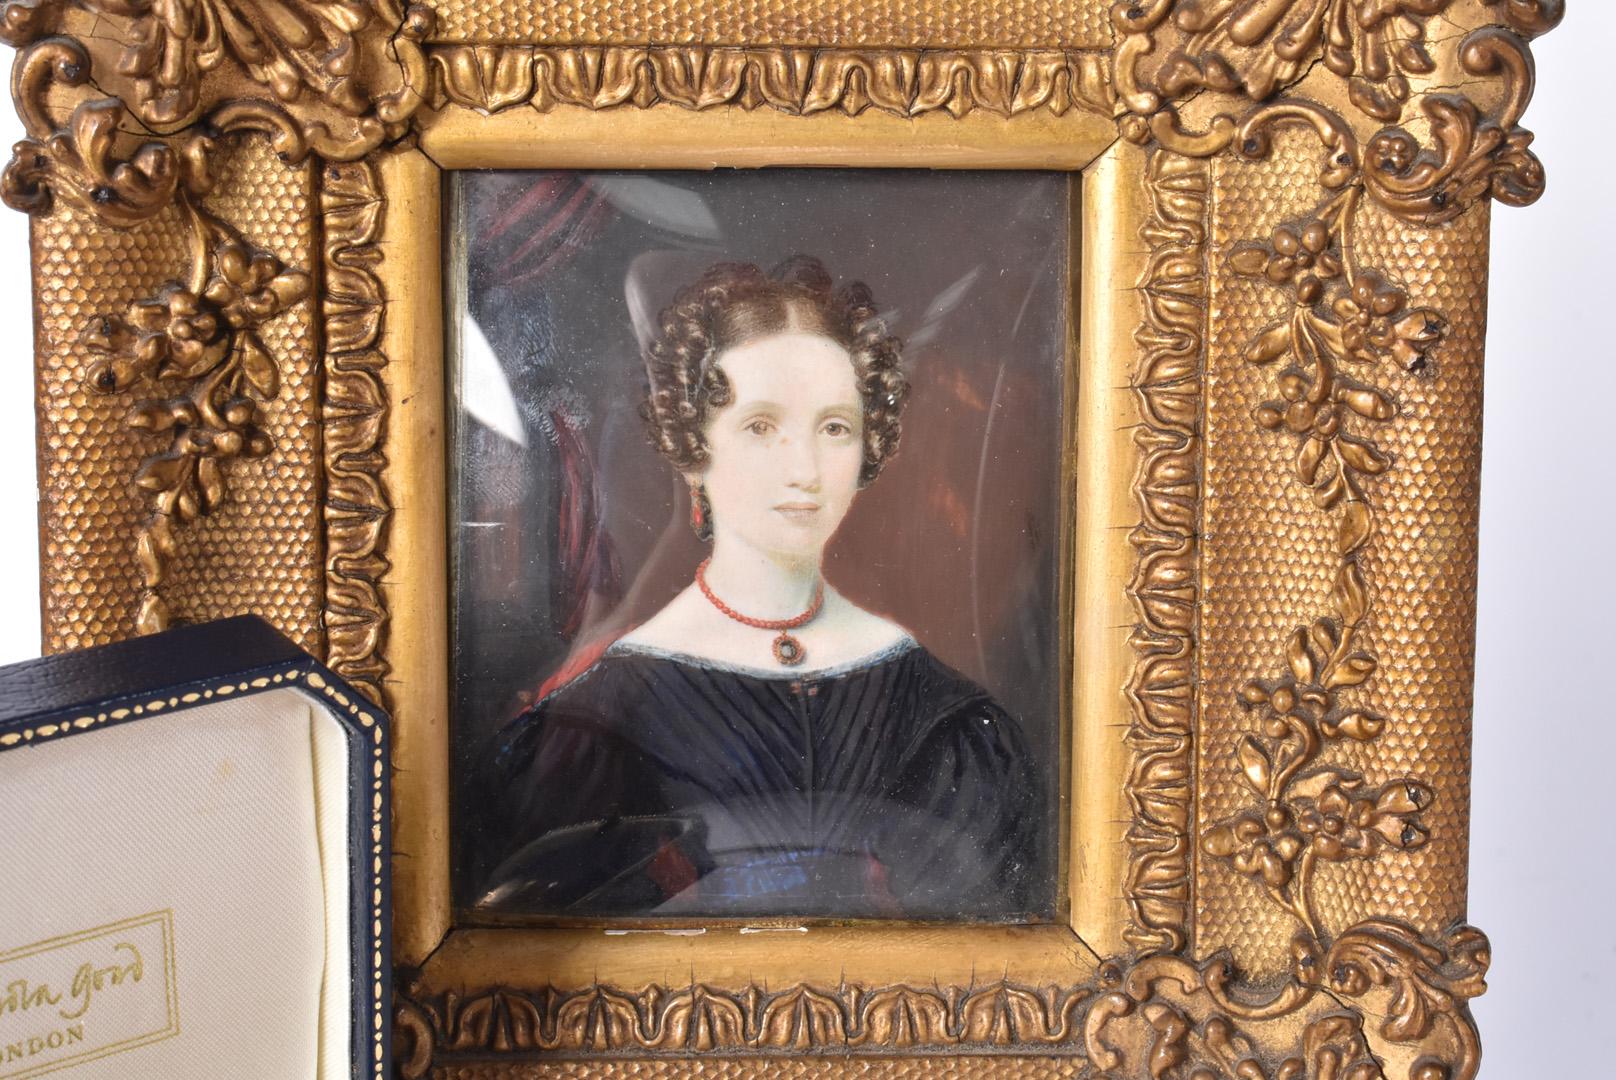 Anna Theresa Stalker (1805-1890), relative of Major General Foster Stalker, hand painted portrait on - Image 2 of 3